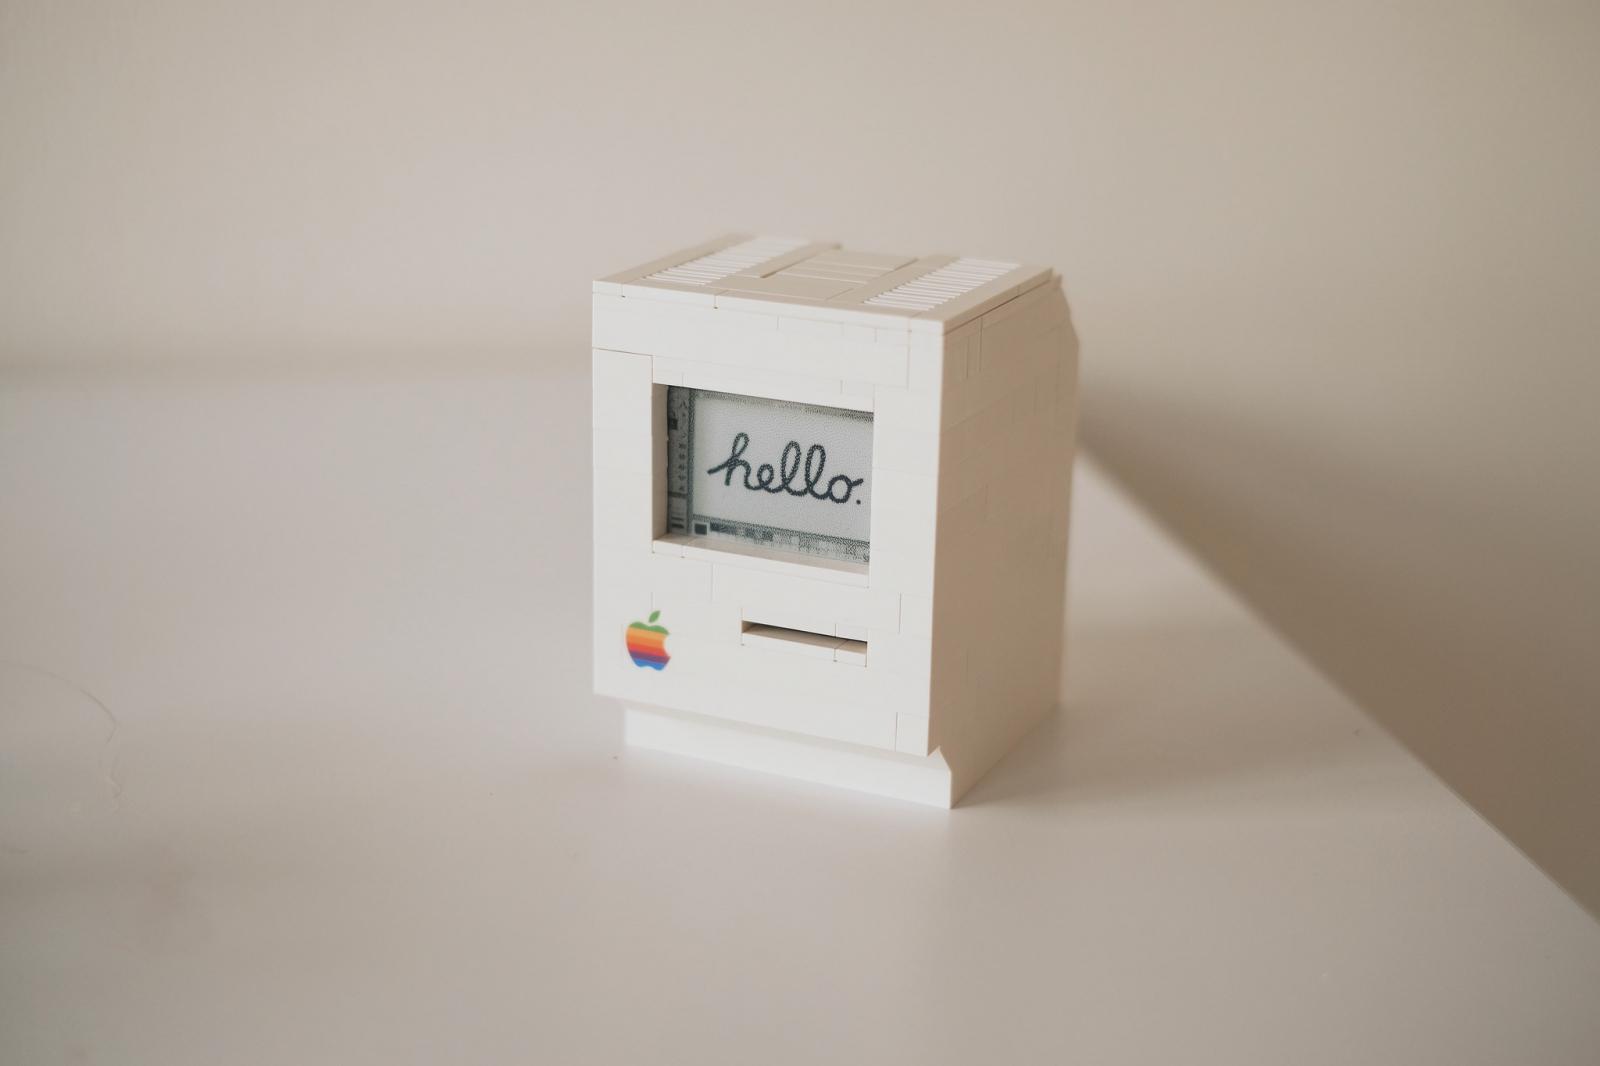 Lego Macintosh Raspberry Pi